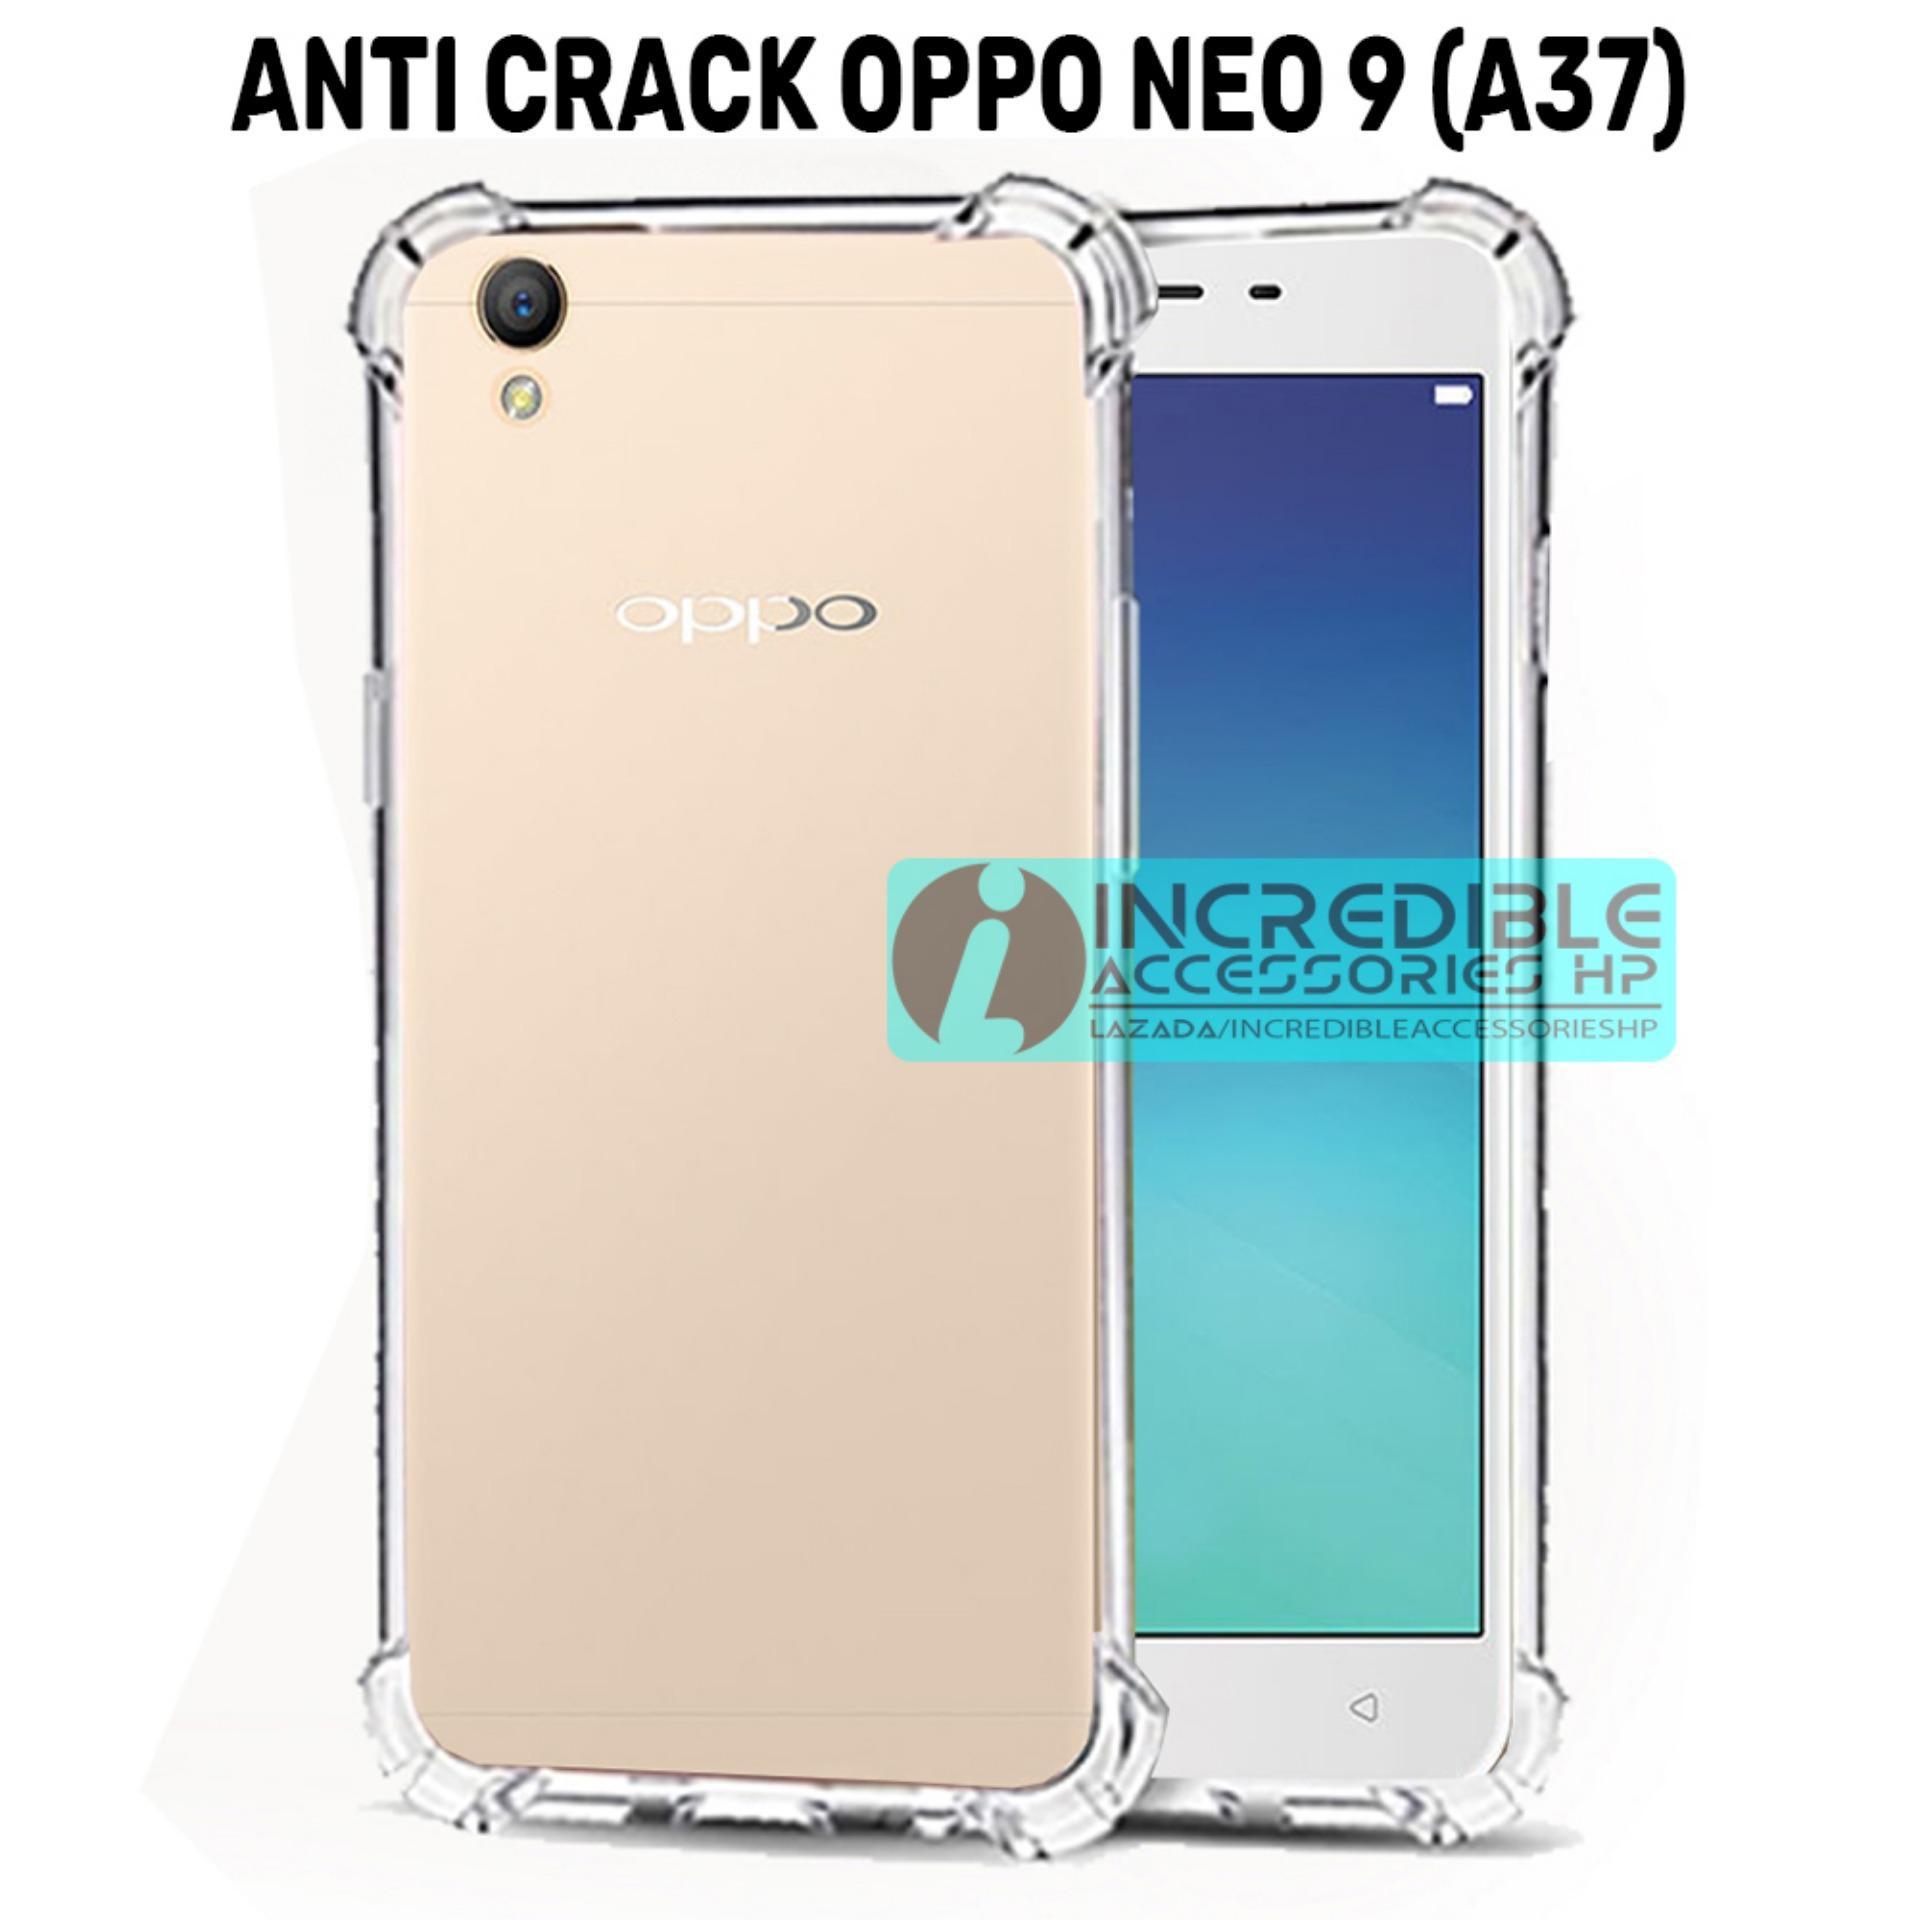 mr-oppo-joy-3-oppo-a11w-oppo-a11w-joy3-tempered-glass-anti-gores-kaca-clear-6132-9068181-48021dfdc3a36a76c786f7a89e8d5bd1-catalog_233 Harga Daftar Harga Hp Oppo Neo 5 2015 Terbaru Maret 2019